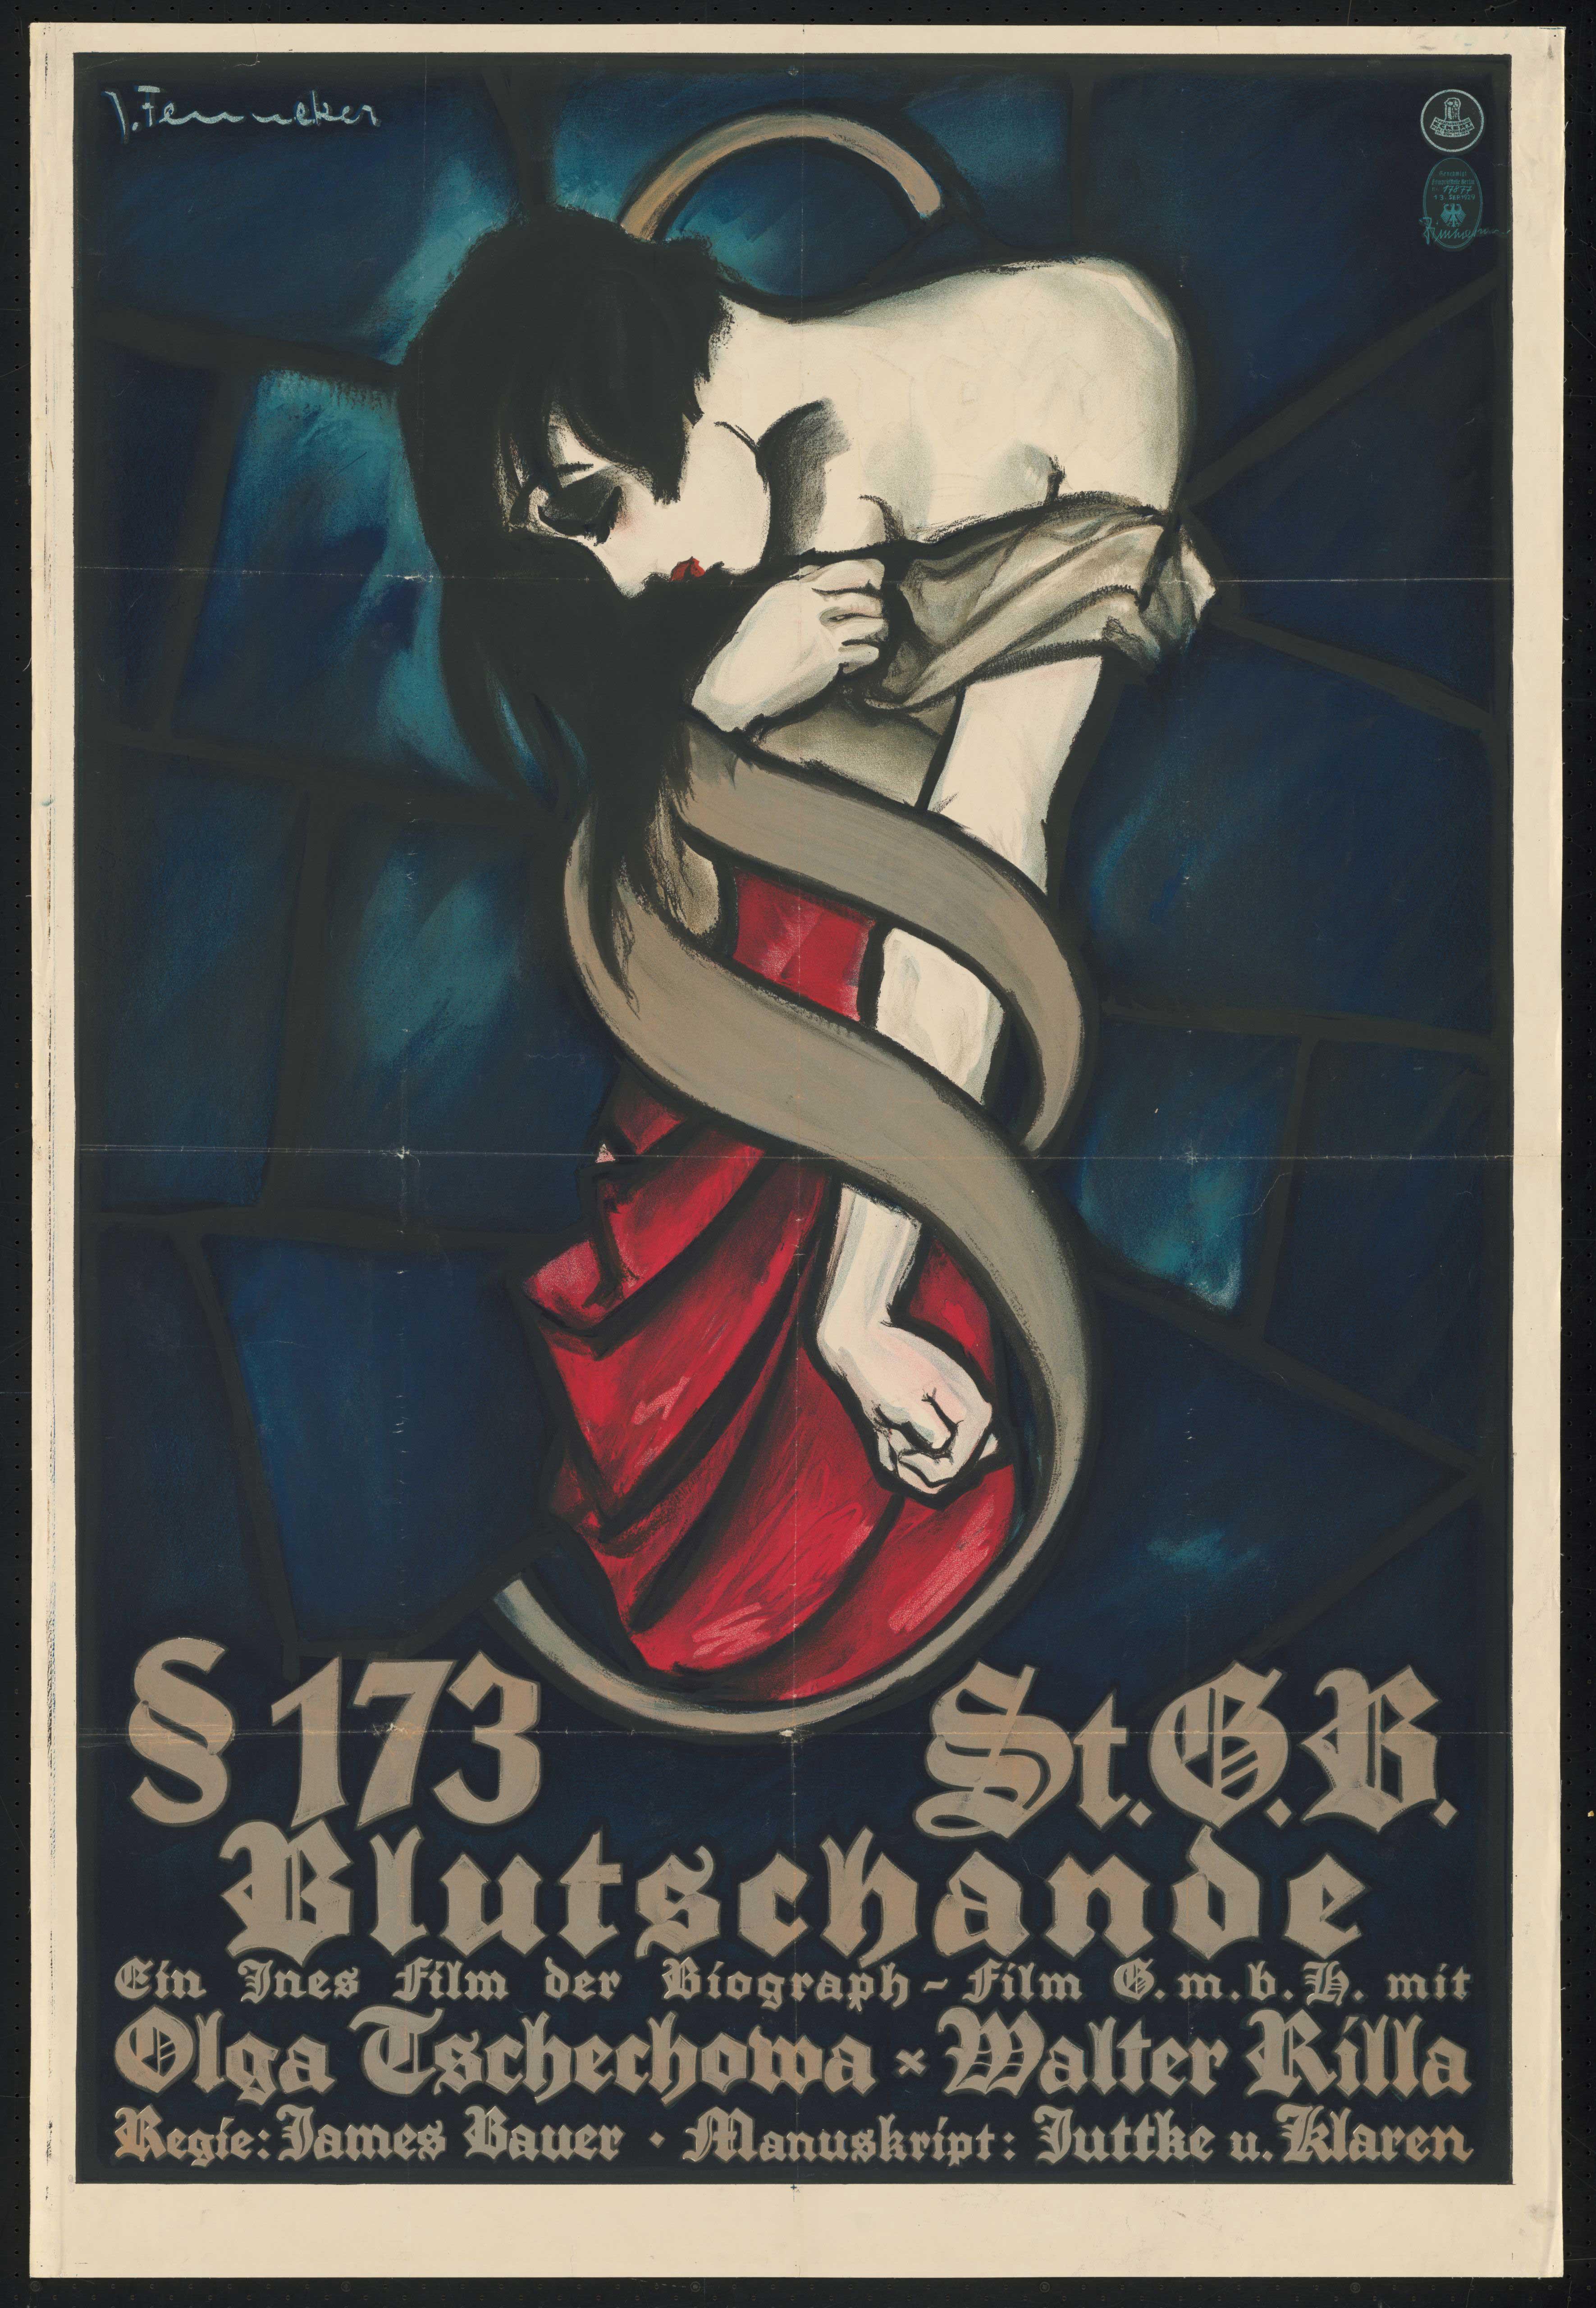 Film poster by Josef Fenneker: § 173 St. G. B. Blutschande, Germany 1929, directed by James Bauer